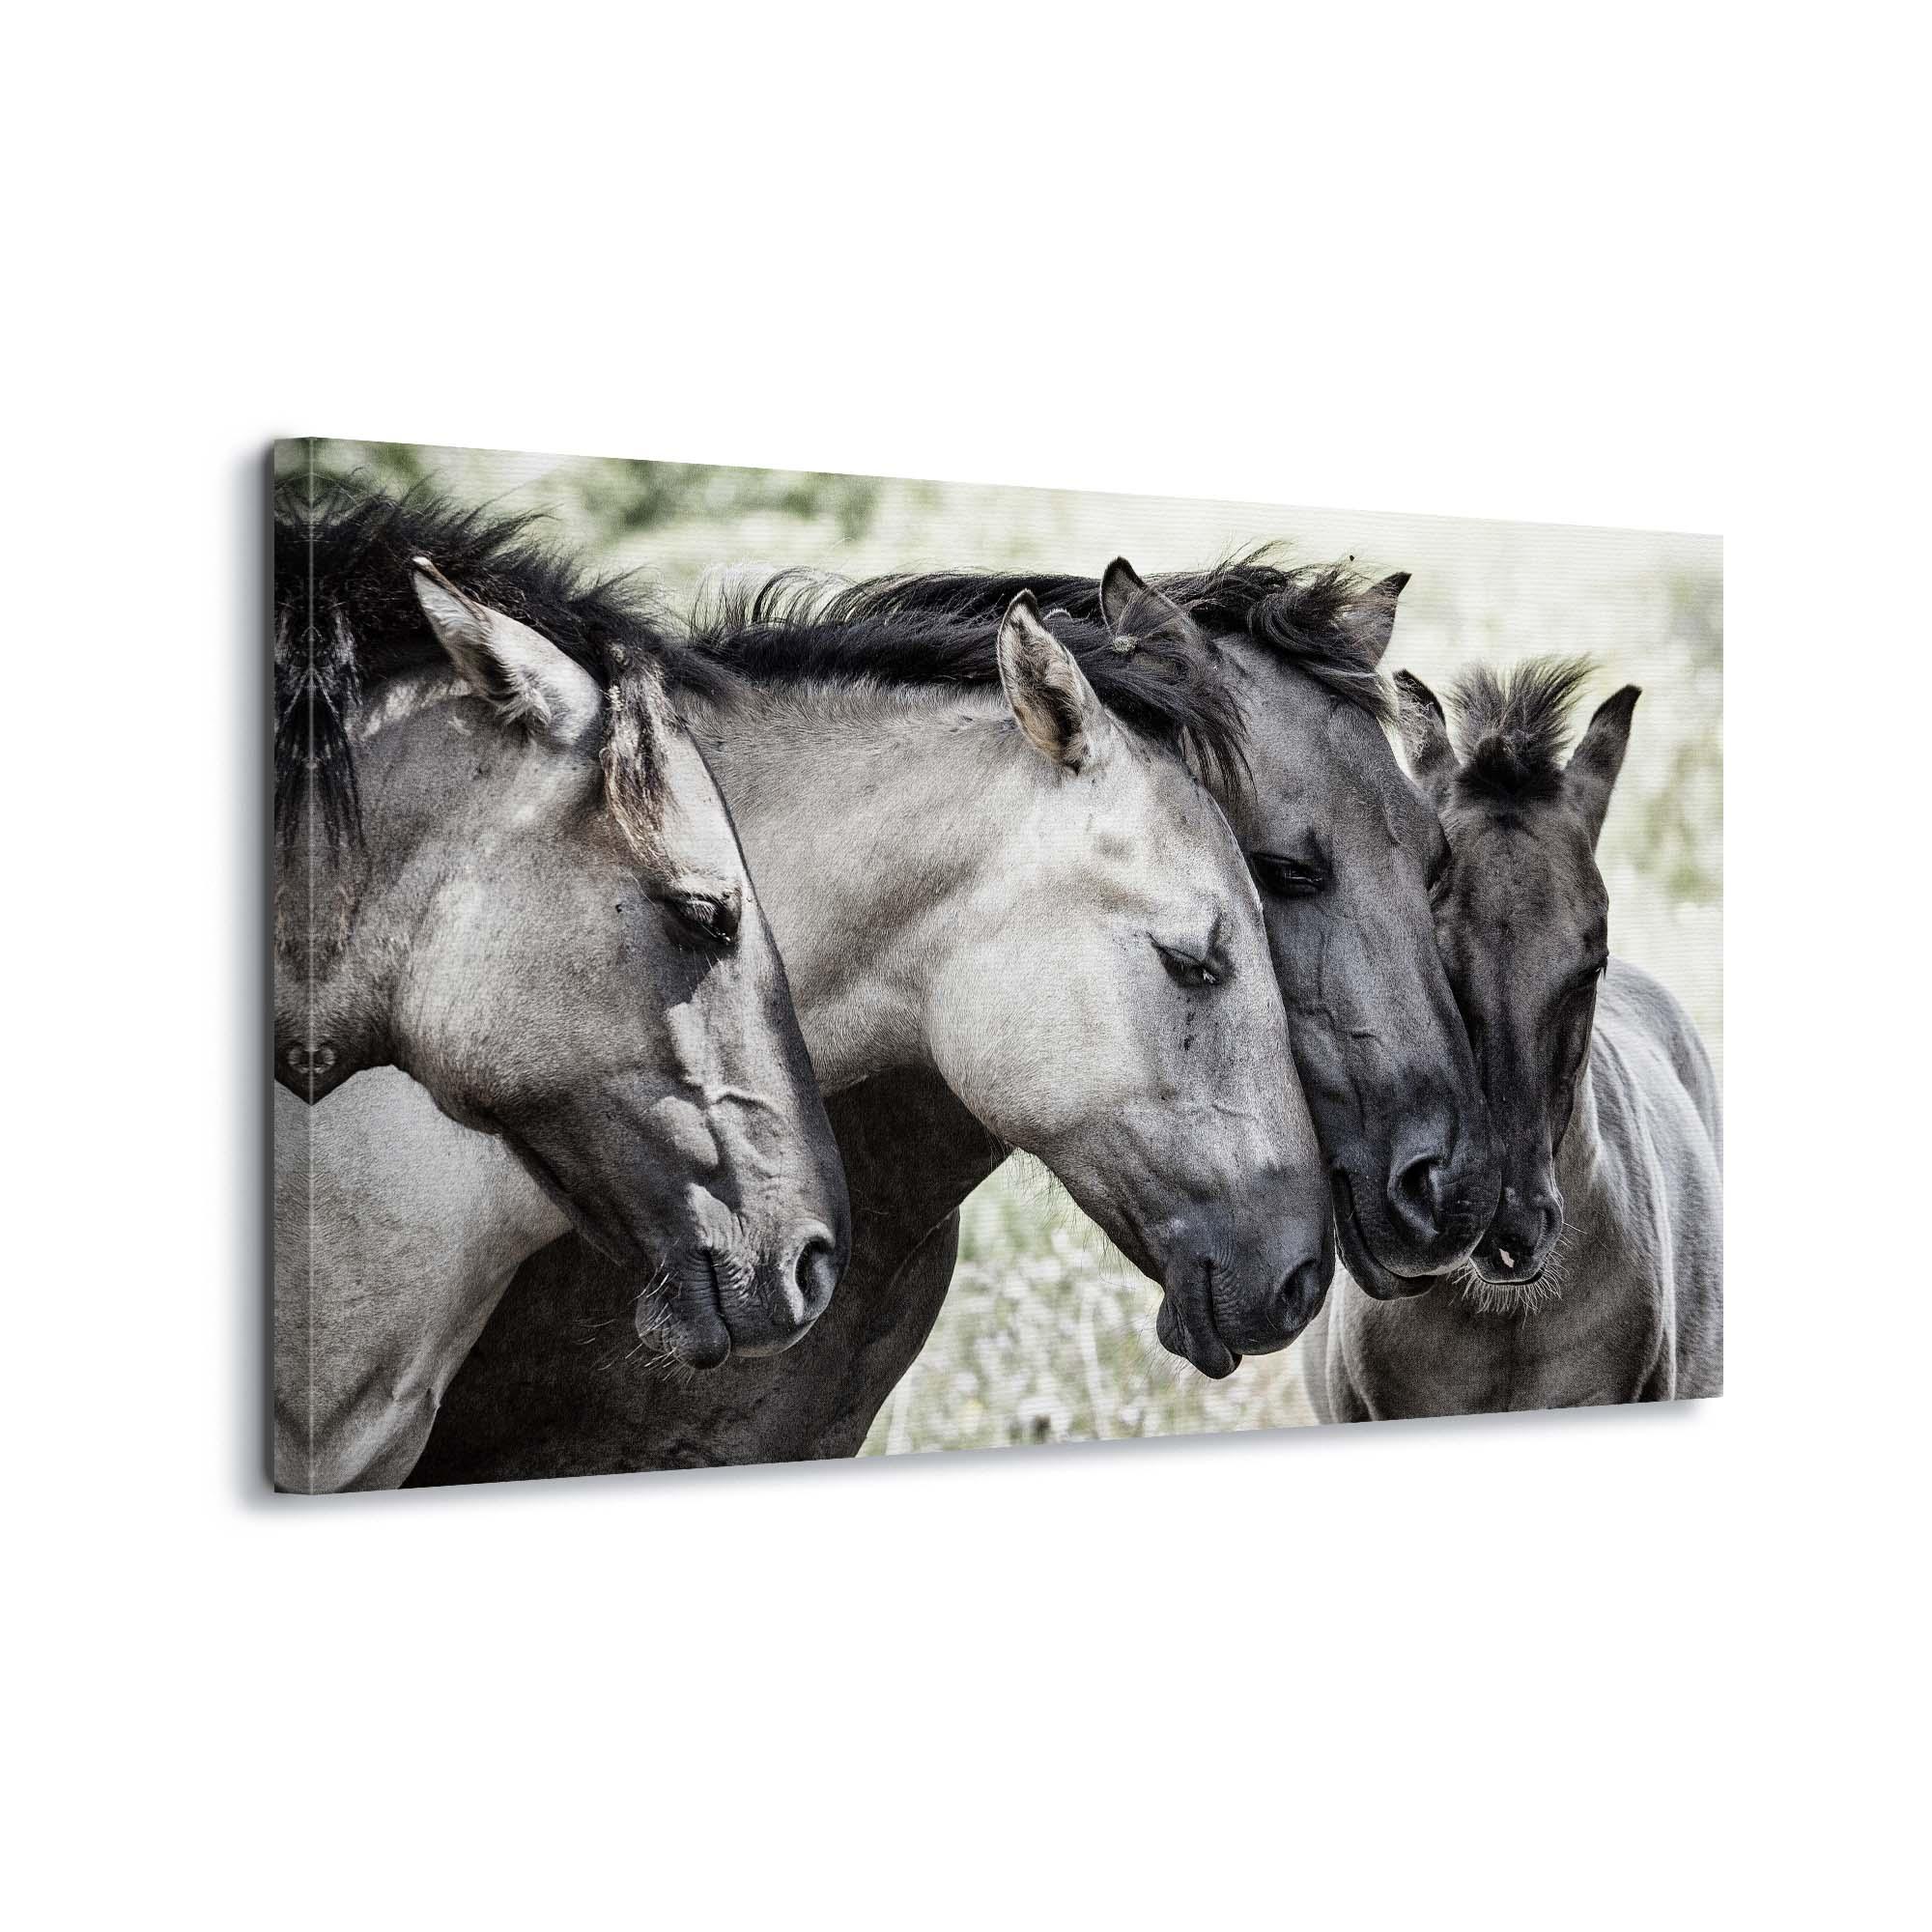 Four Konik Horses by Jaap